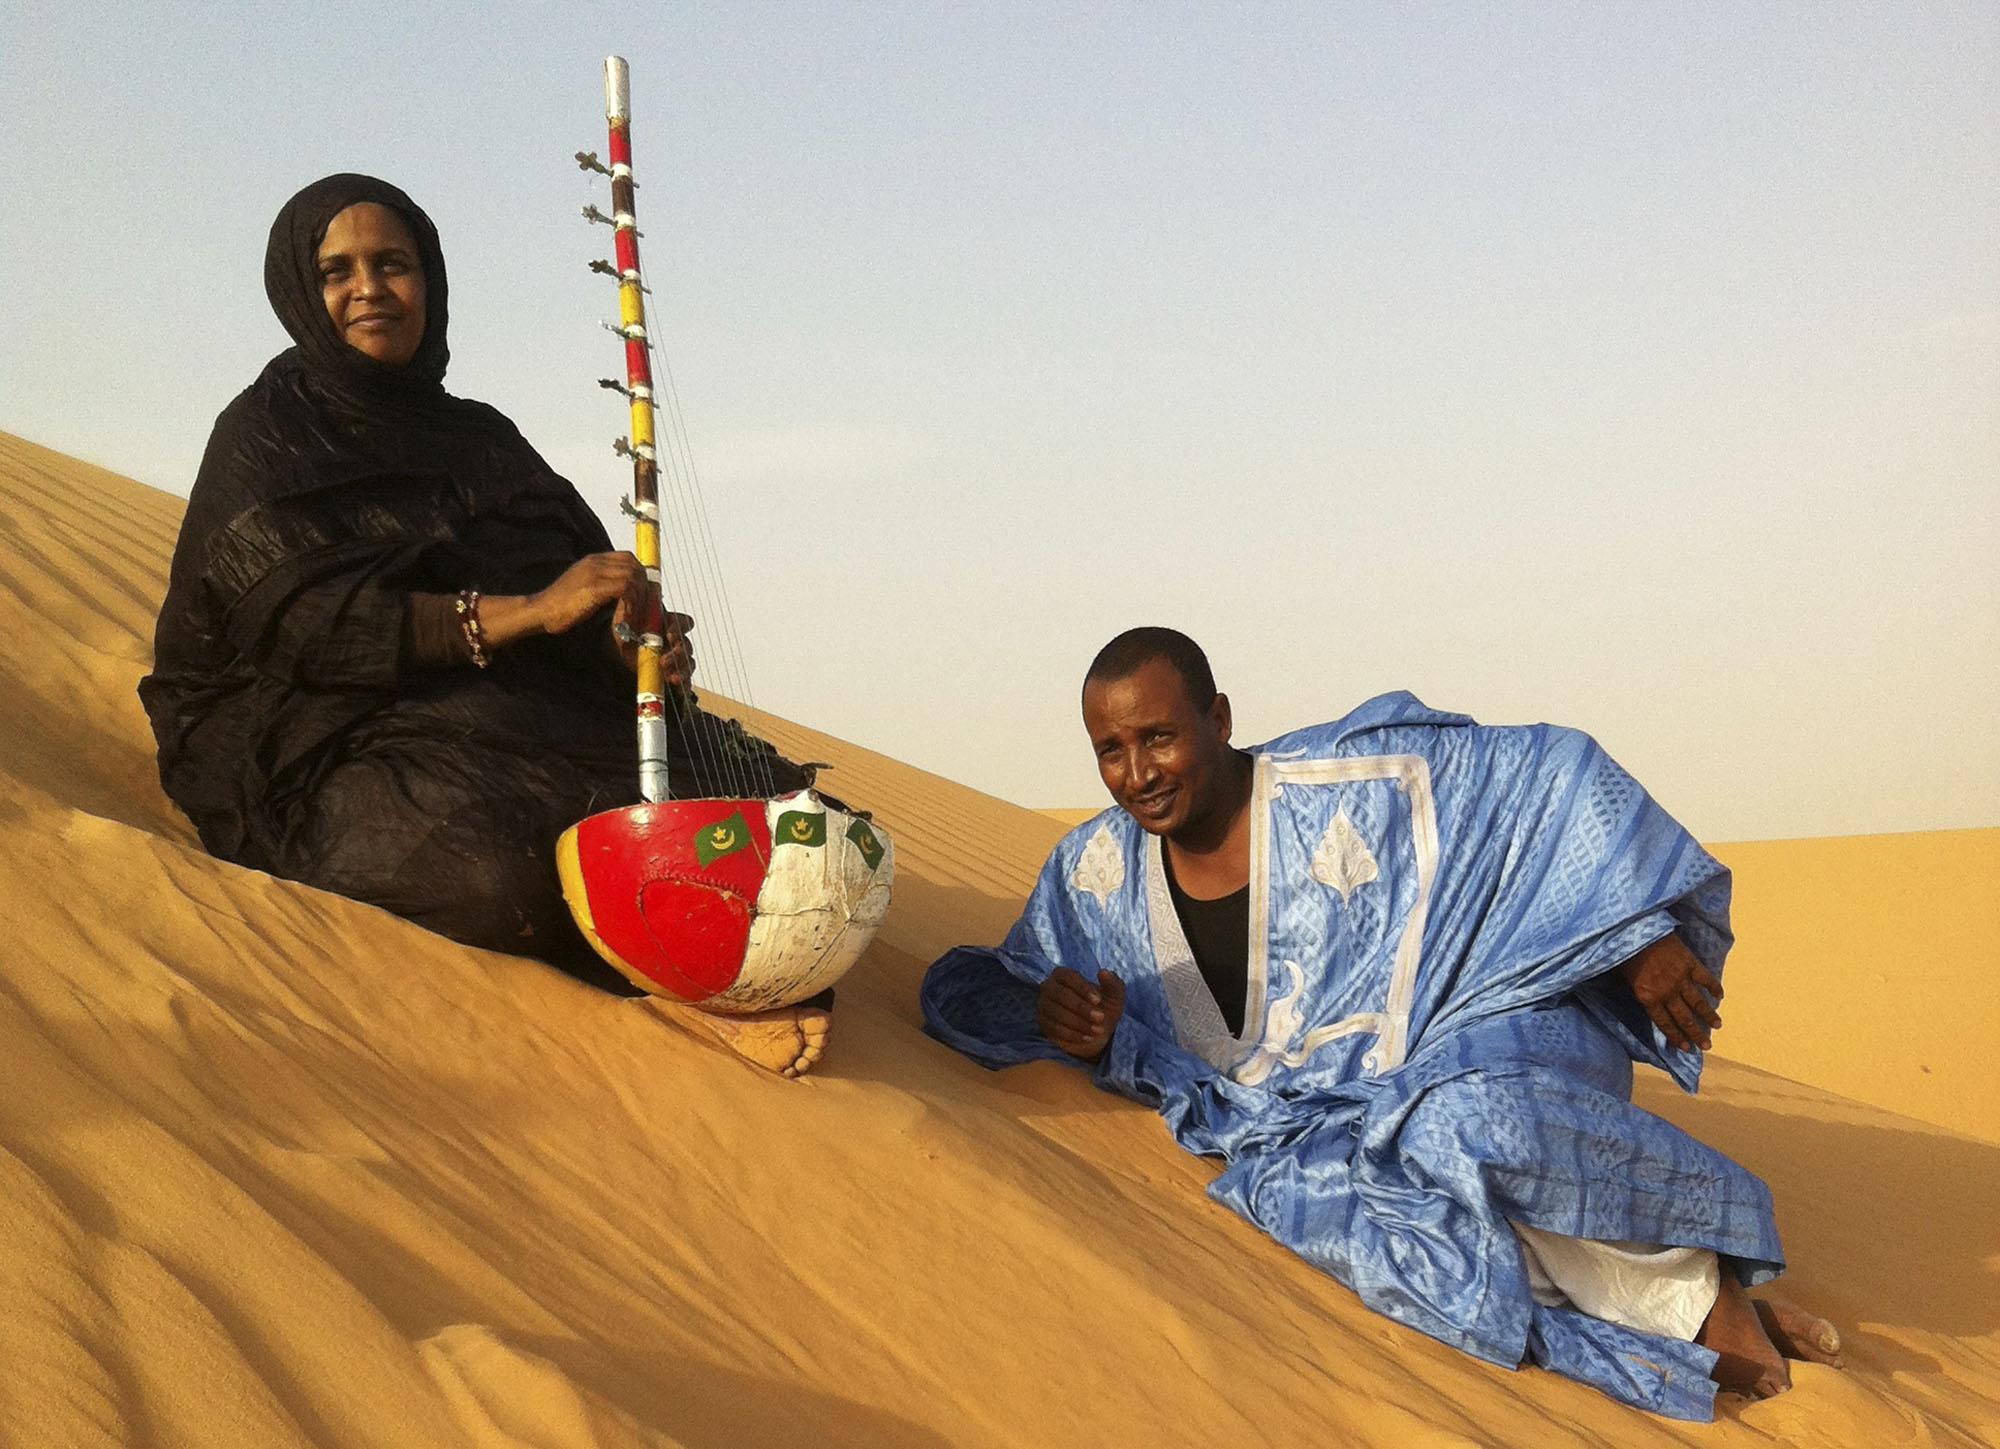 Noura Mint Seymali & Jeich Ould Chighaly